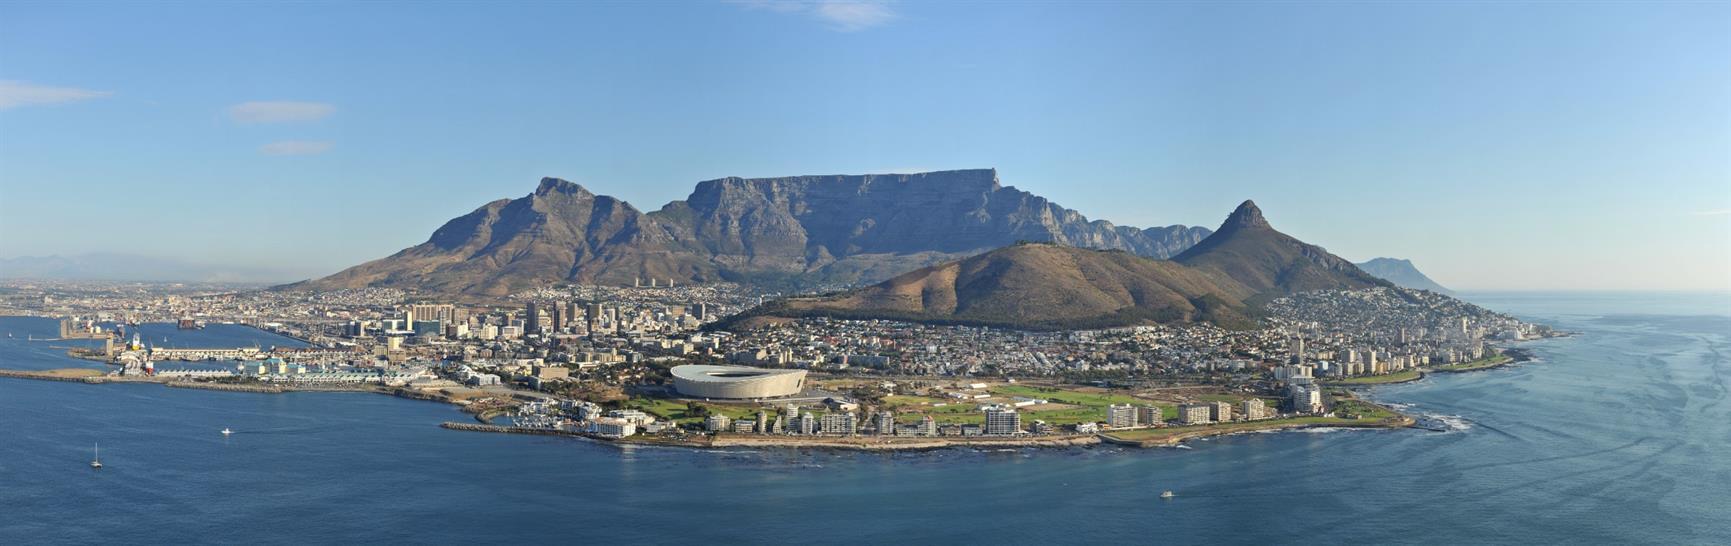 Table Mountain, Cape Town Stadium